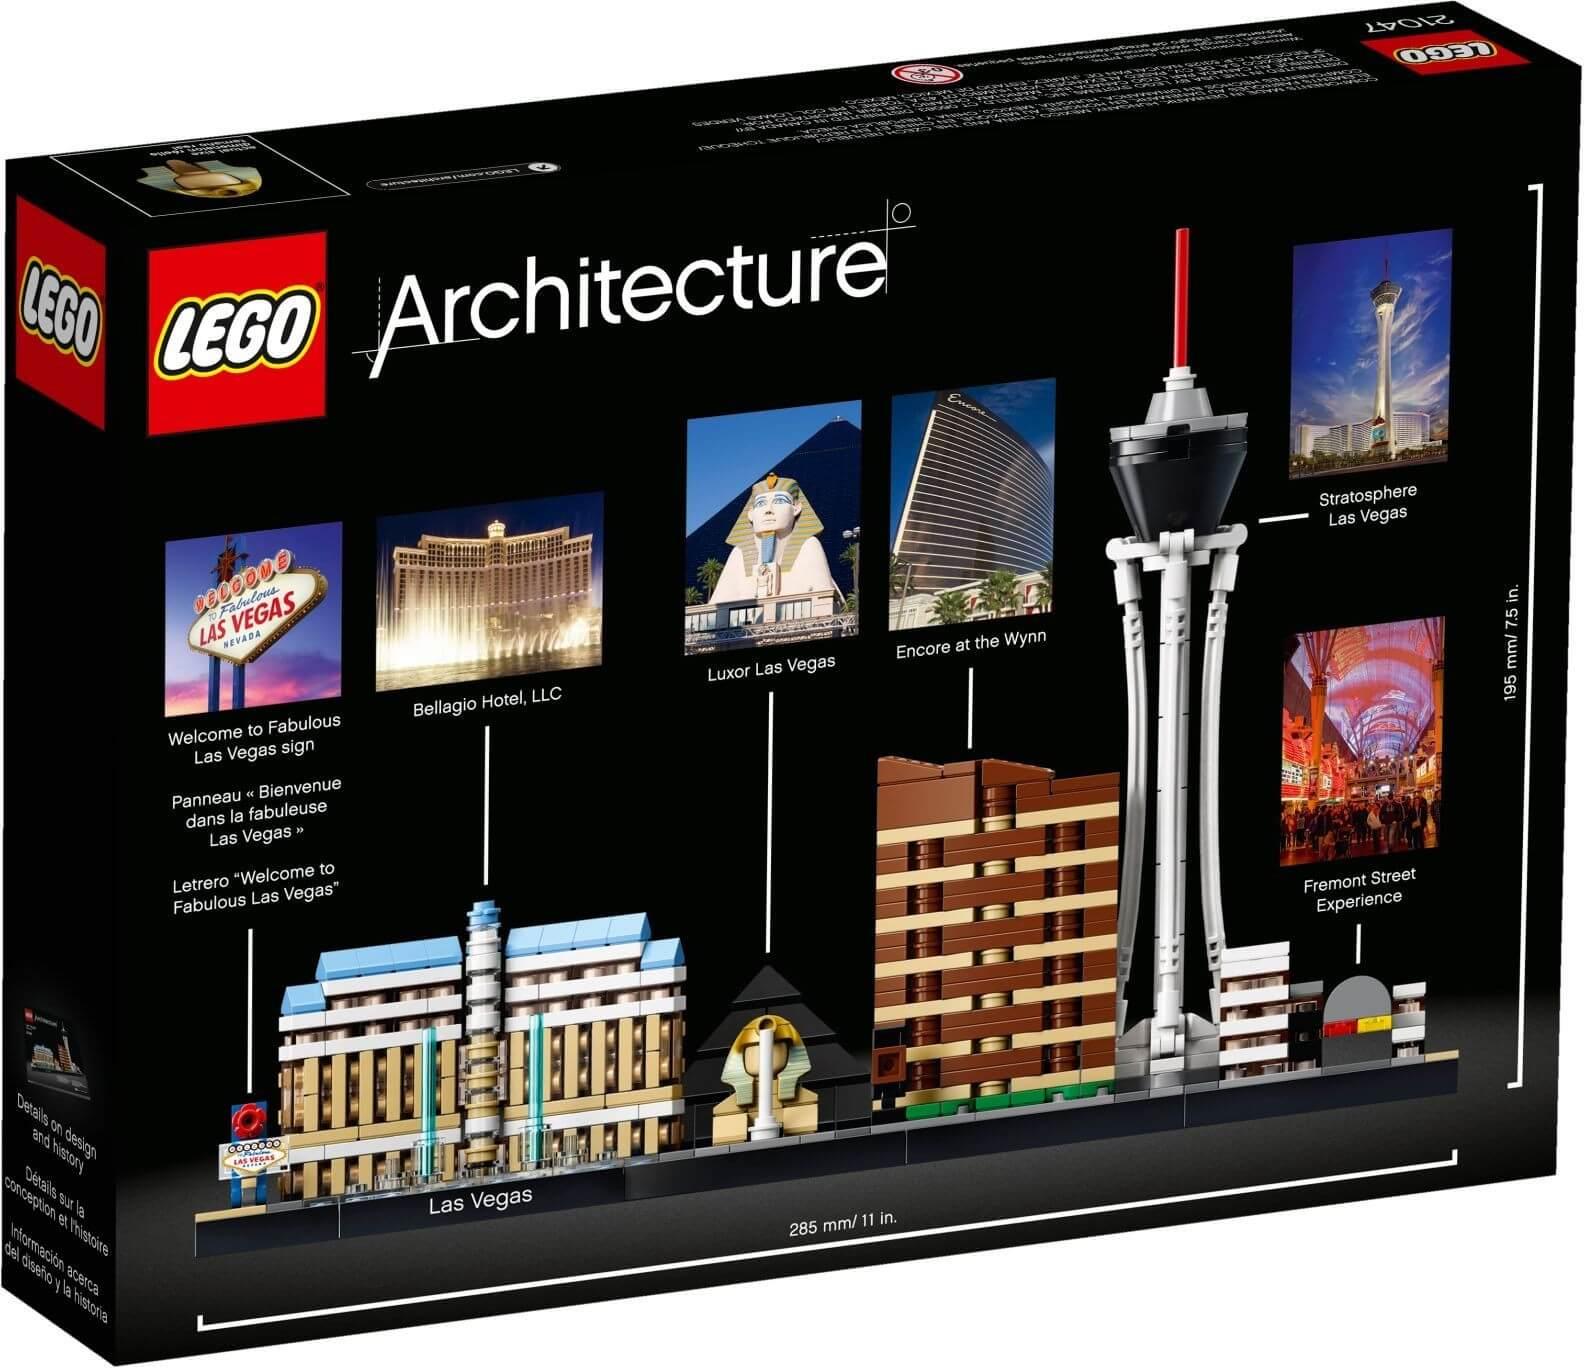 Mua đồ chơi LEGO 21047 - LEGO Architecture 21047 - Thành Phố Las Vegas (LEGO 21047 Las Vegas)